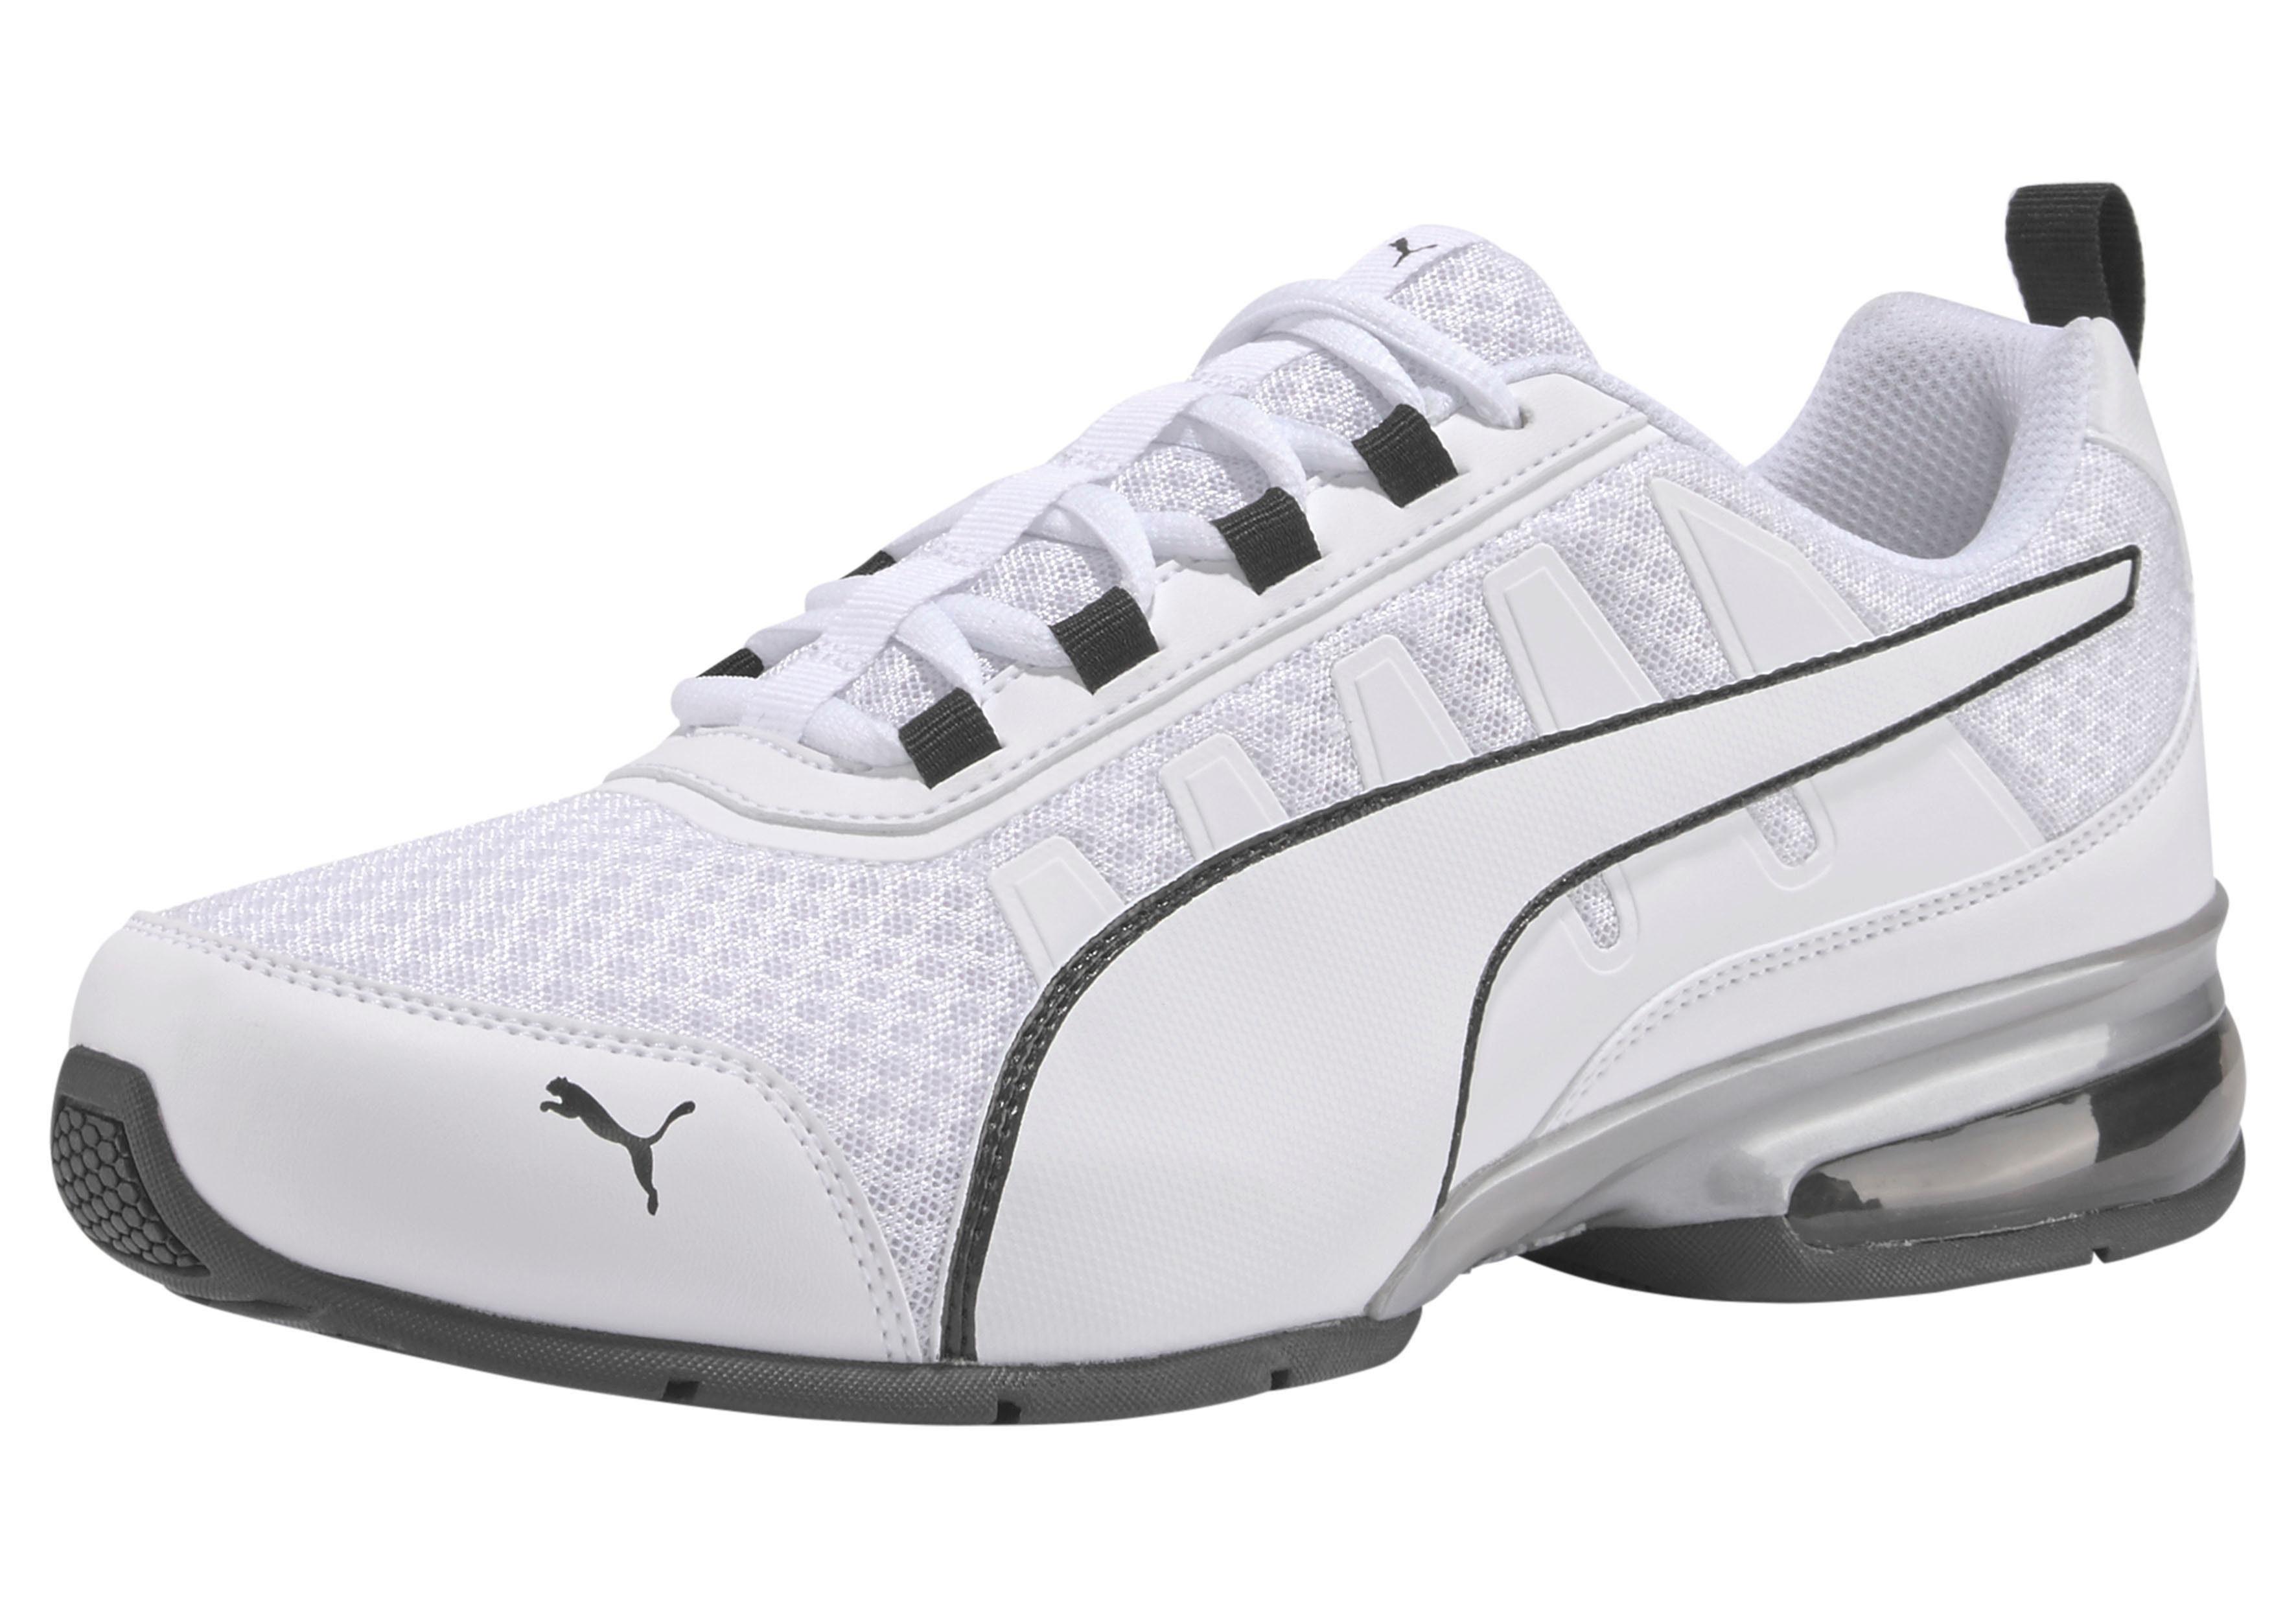 PUMA Leader VT Mesh Low Boot Sneaker Sportschuhe Schwarz Silber, Größenauswahl:42